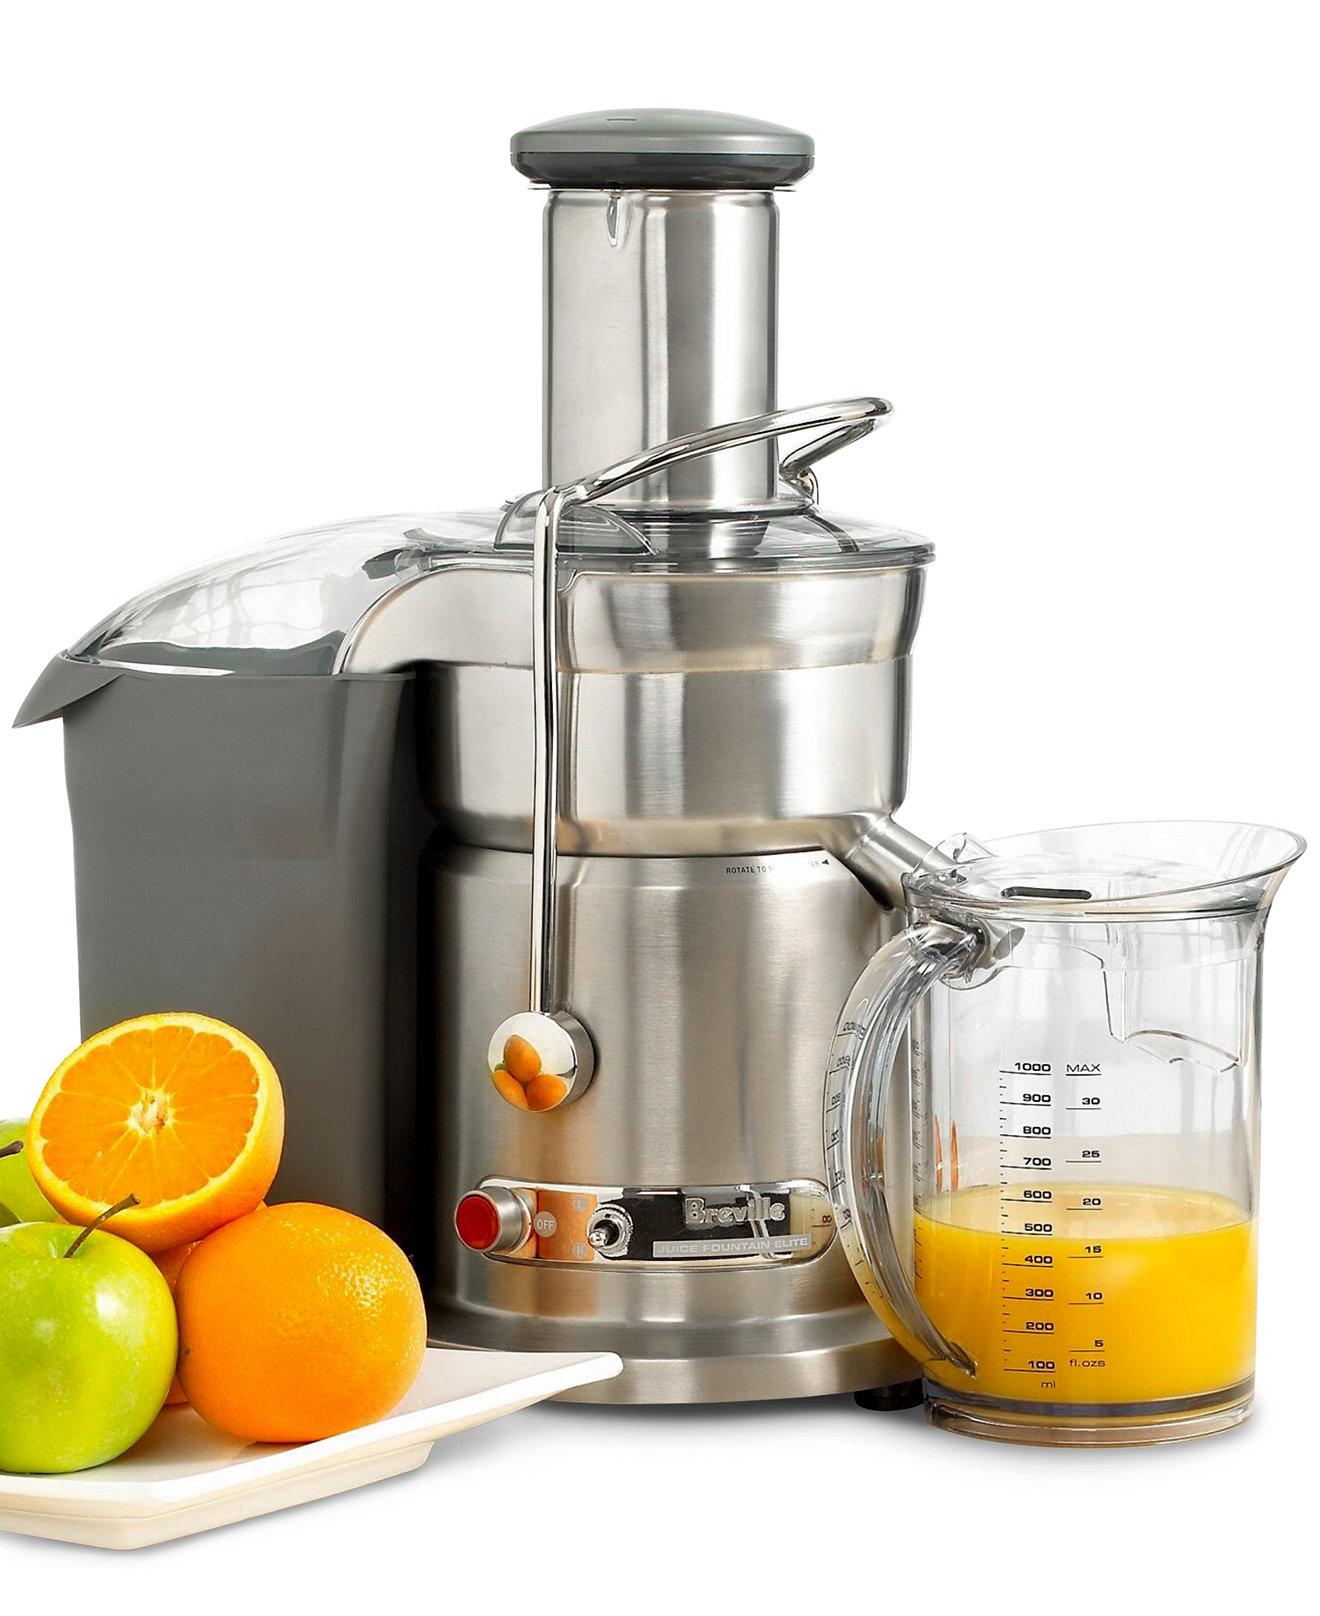 Slow Juicer Walita : Juicer Juice images